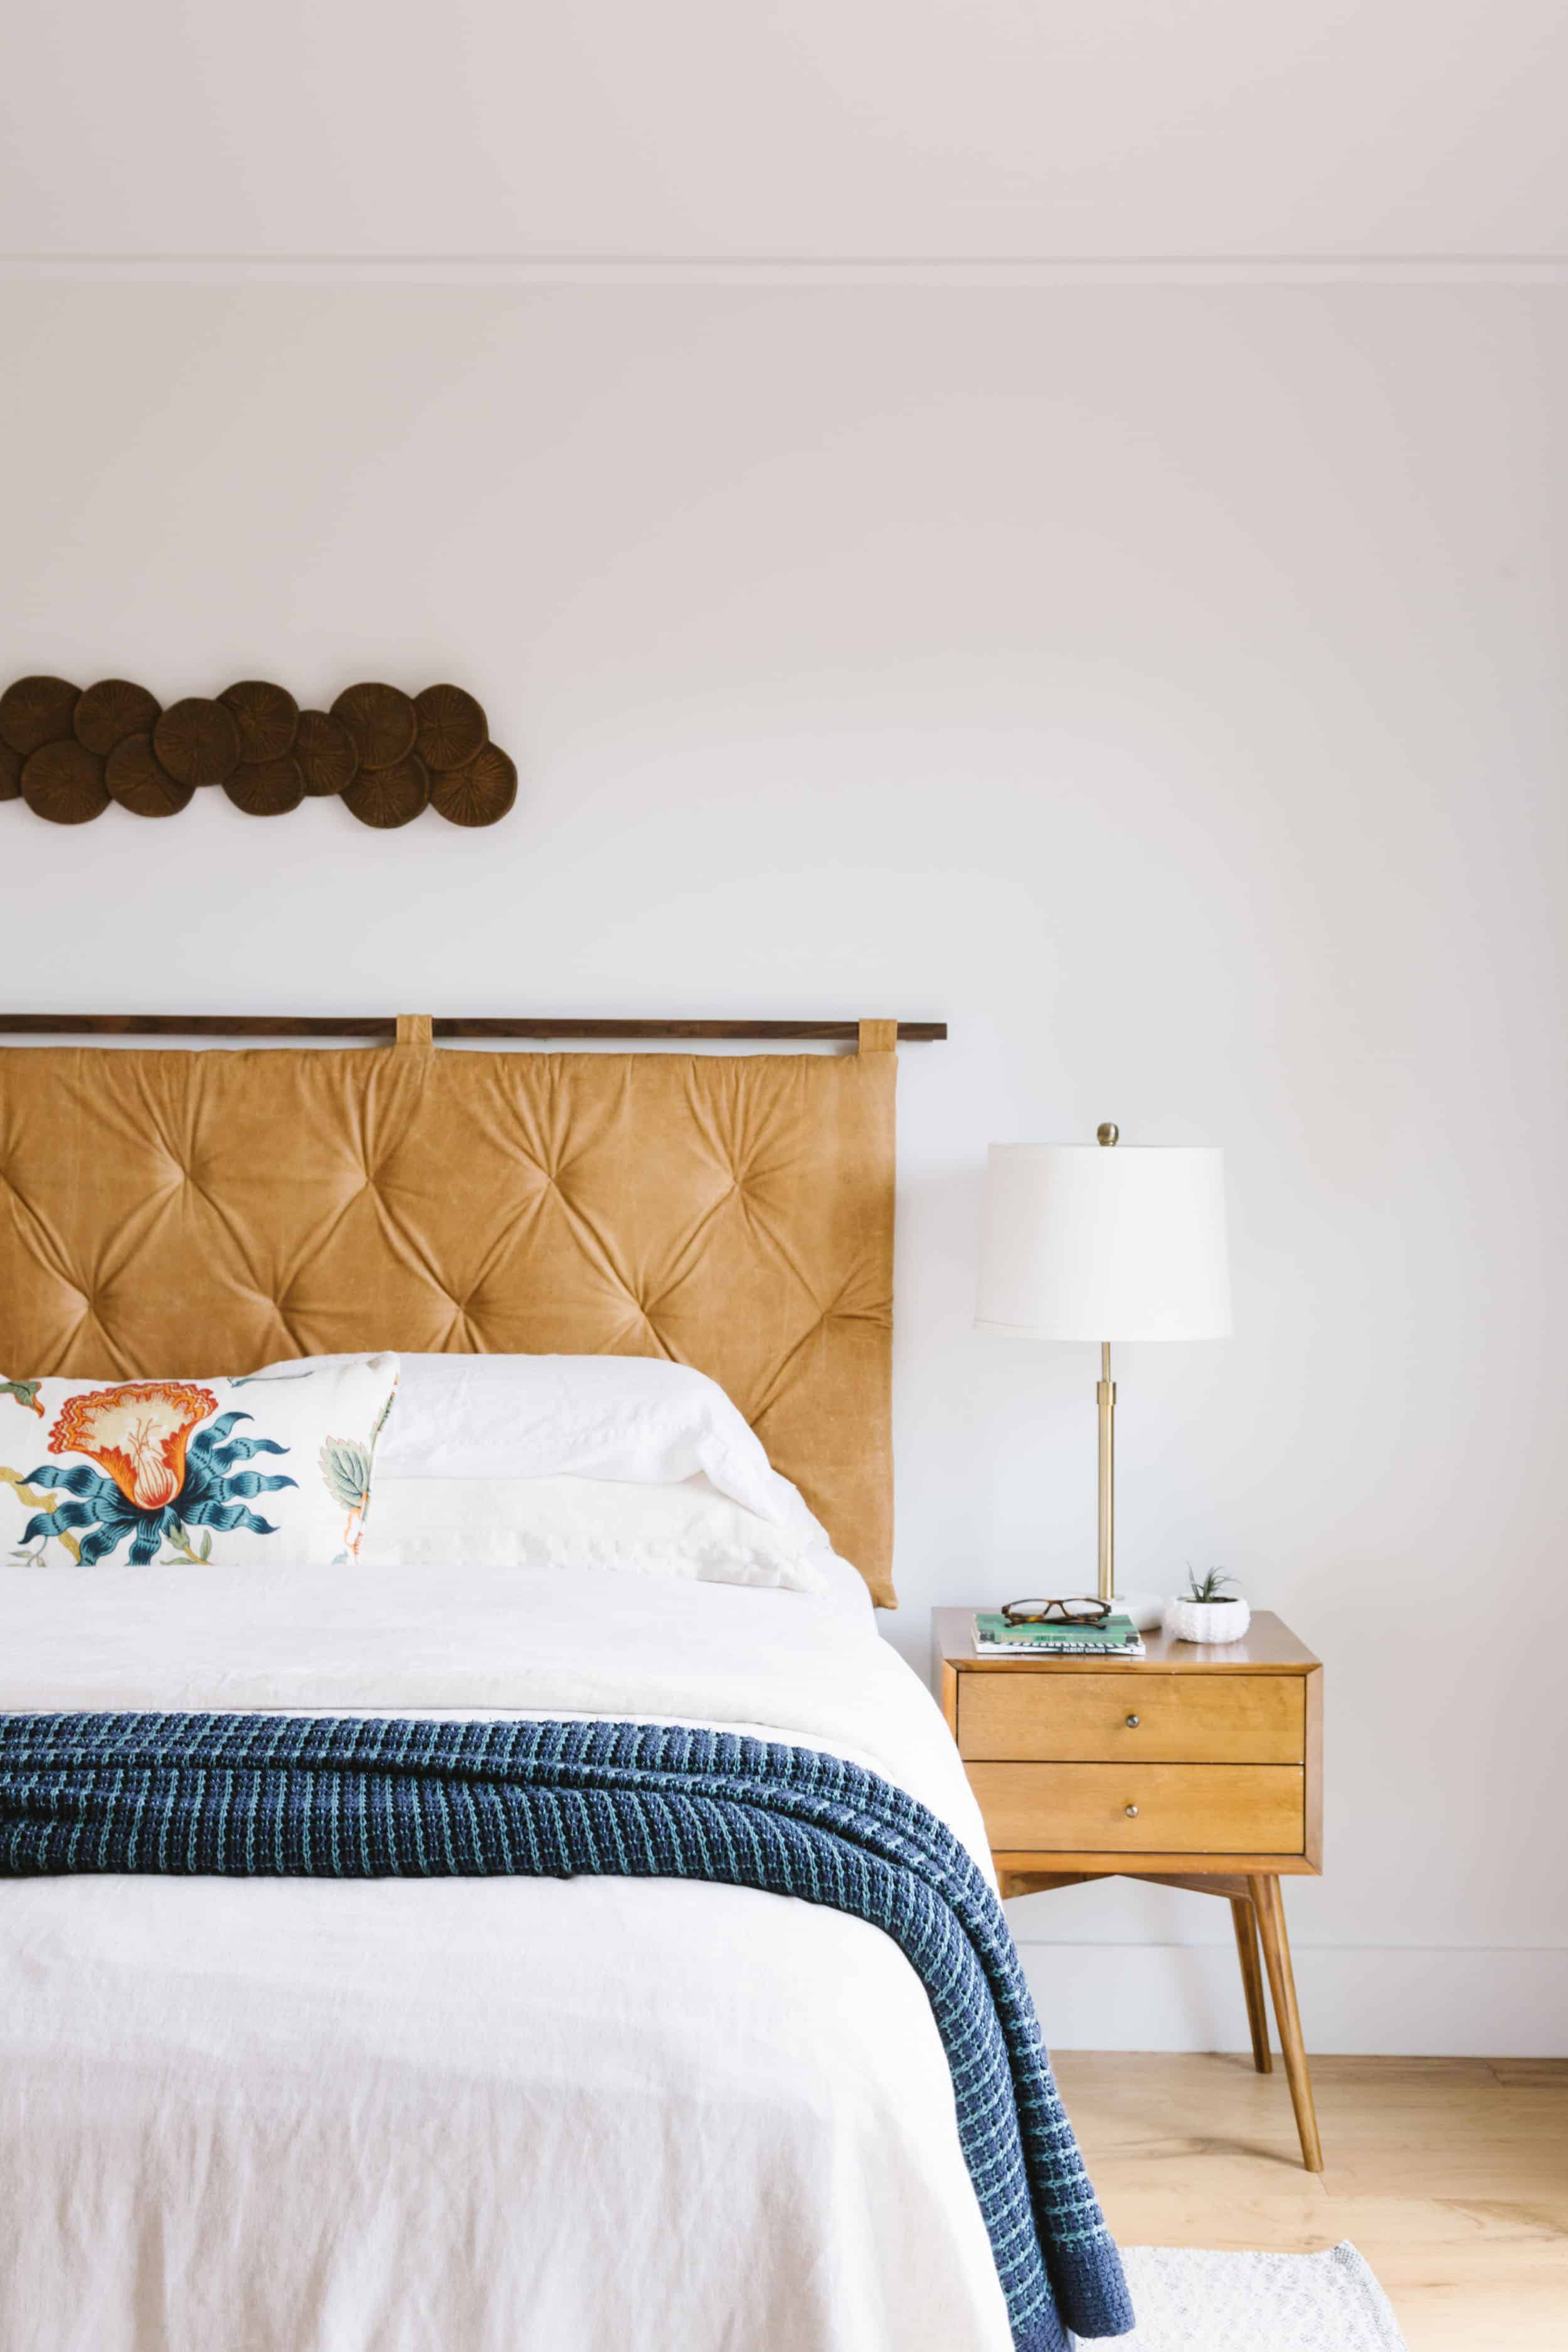 Samantha Gluck Emily Henderson Bedroom Vintage Inspired